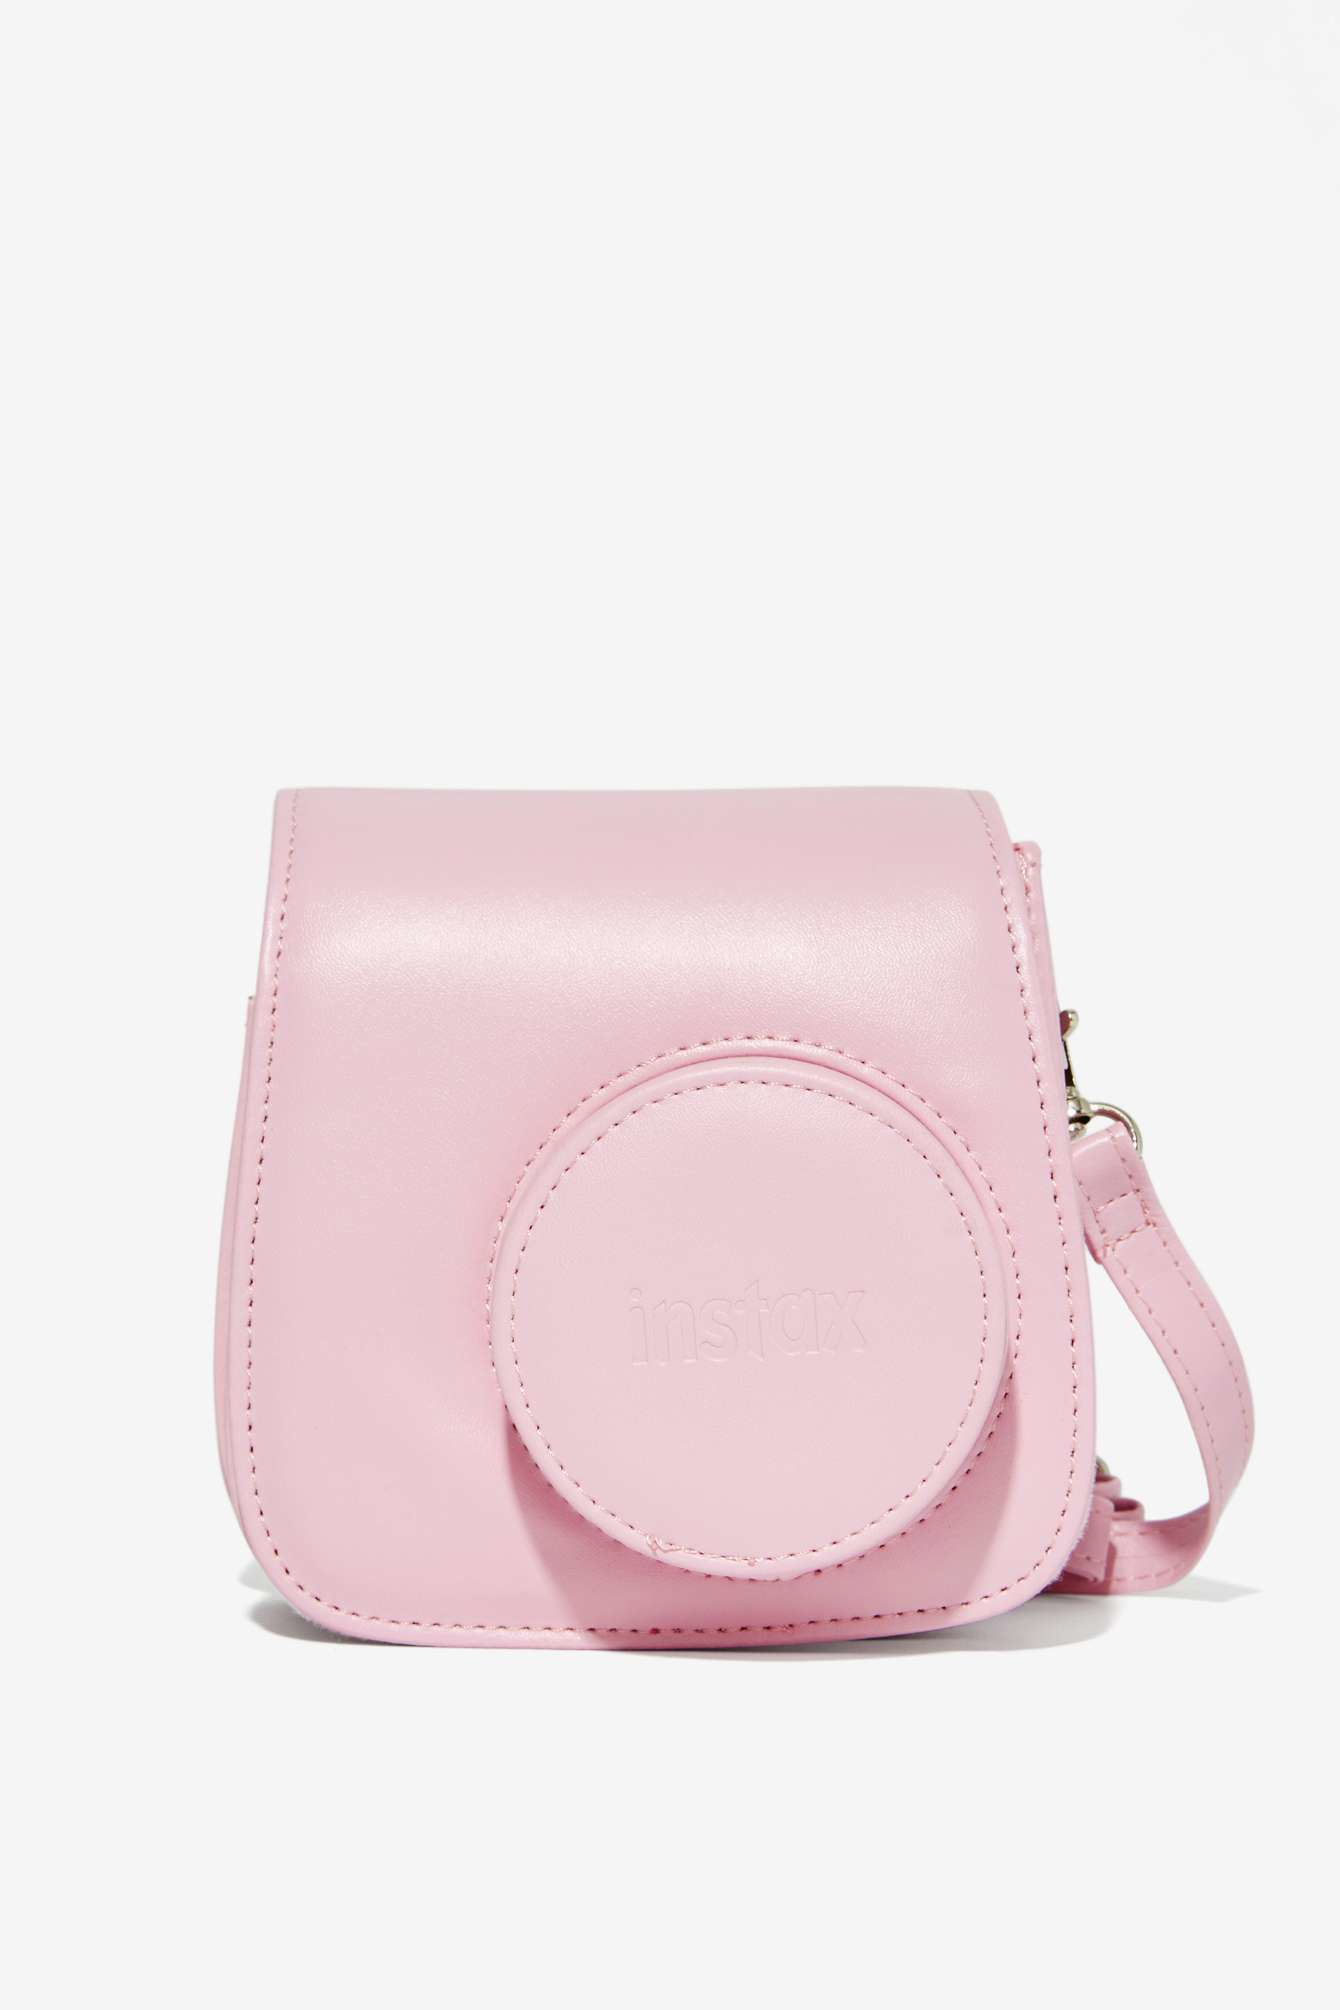 Nasty gal Fujifilm Instax Mini 8 Groovy Case in Pink | Lyst